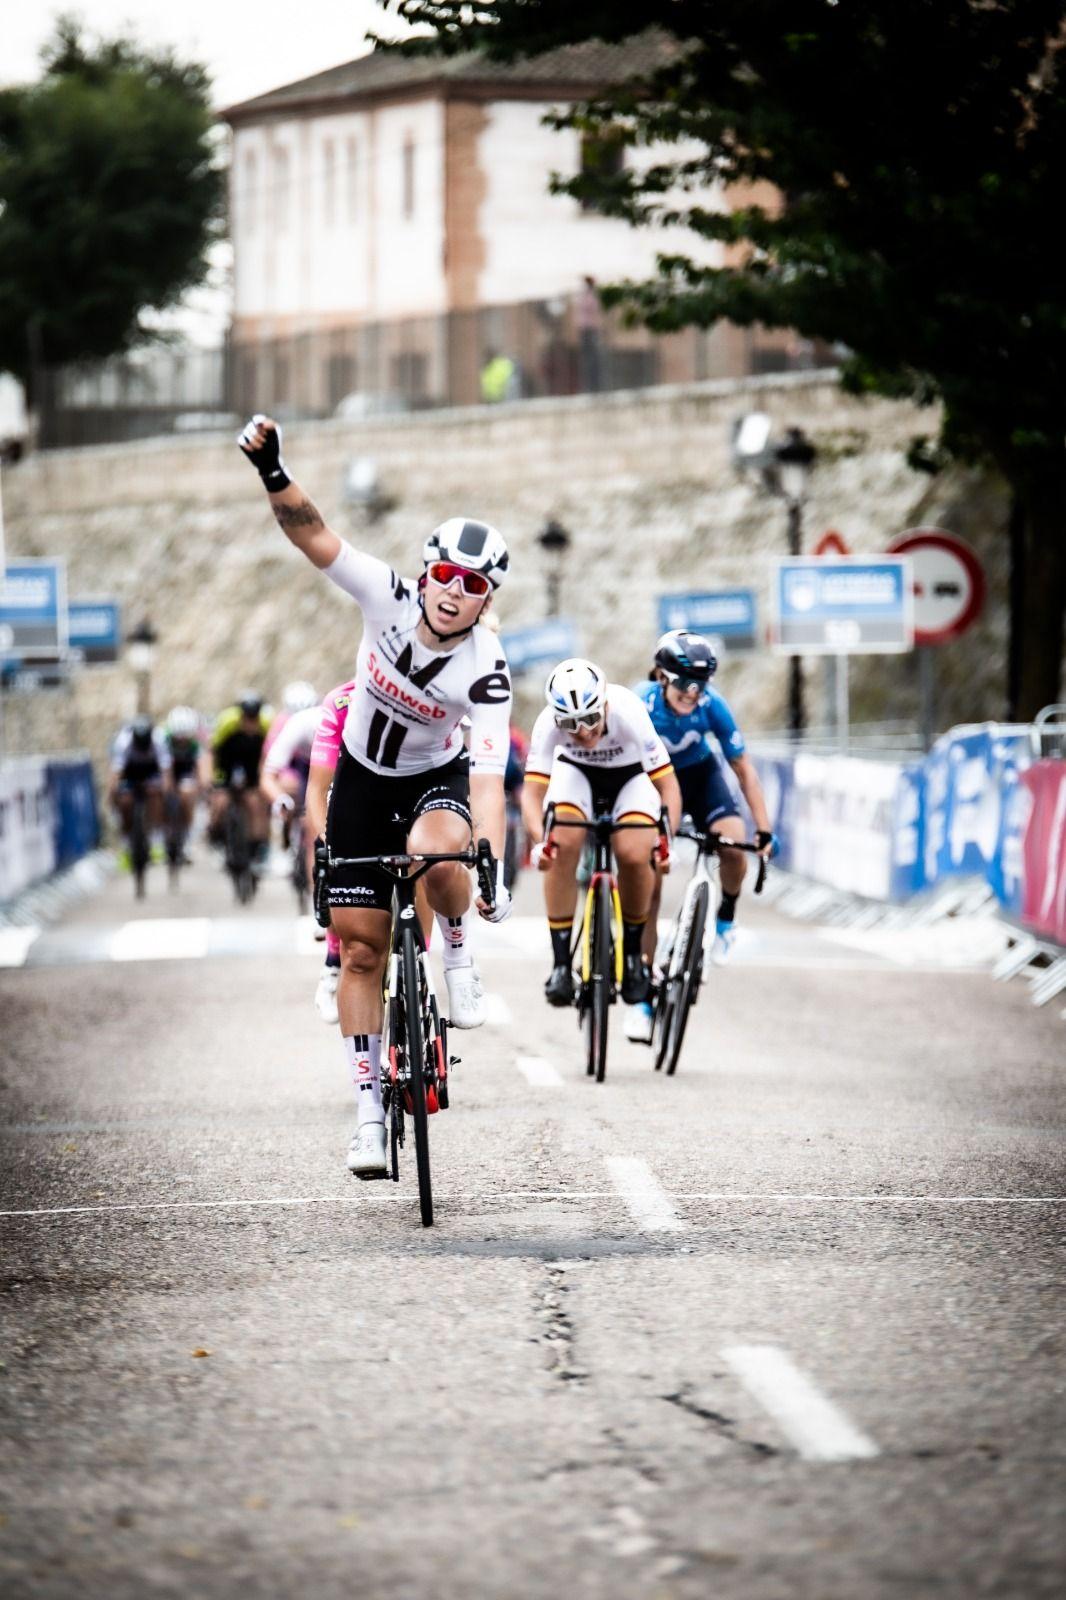 Lorena Wiebes, ganadora de la 1ª Etapa de la Vuelta a España Femenina